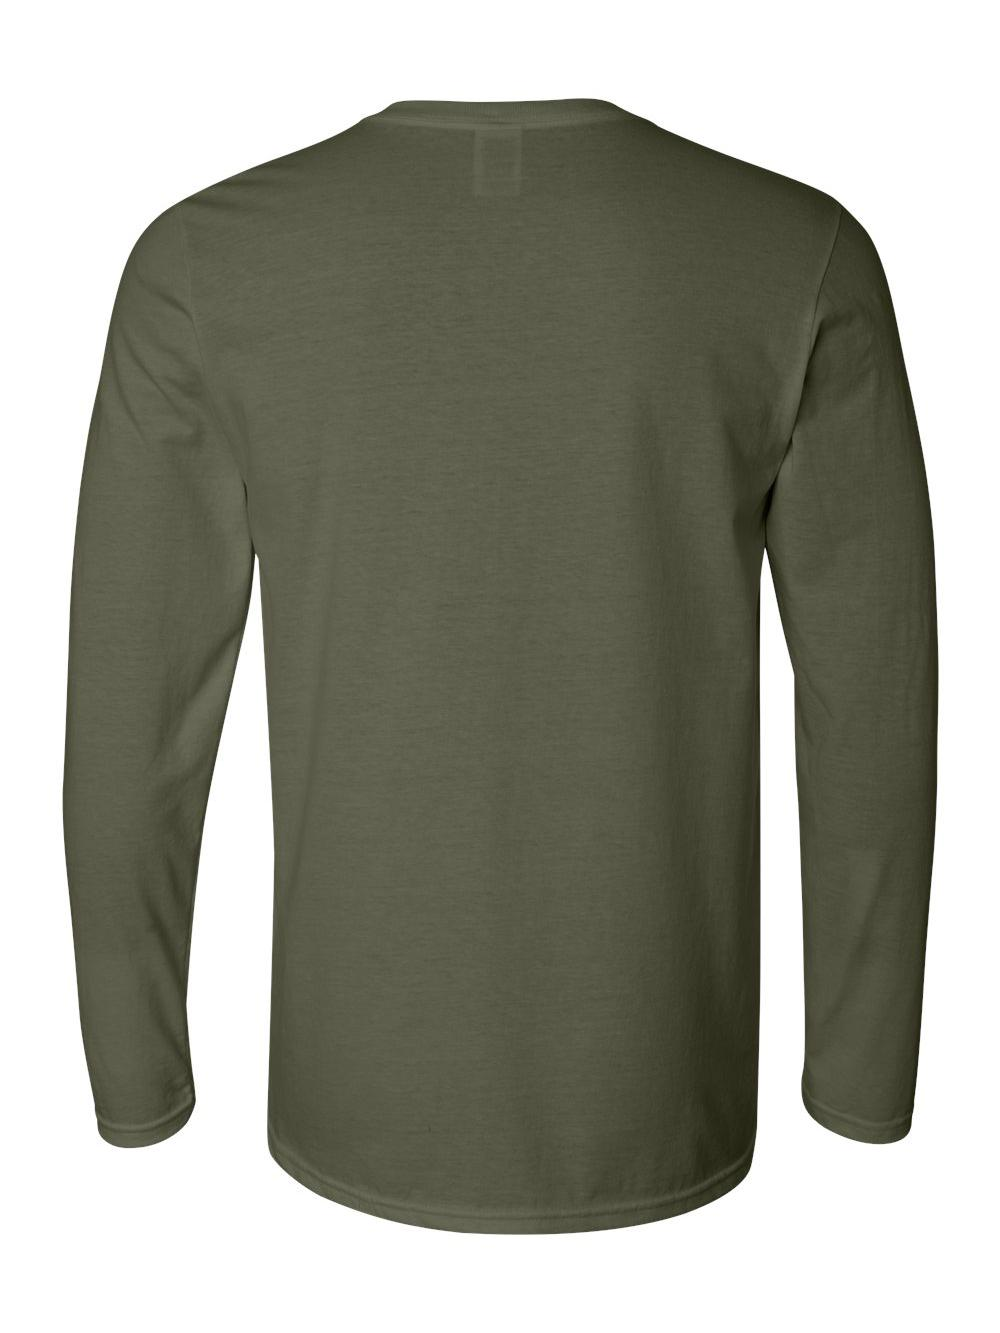 Gildan-Softstyle-Long-Sleeve-T-Shirt-64400 thumbnail 13